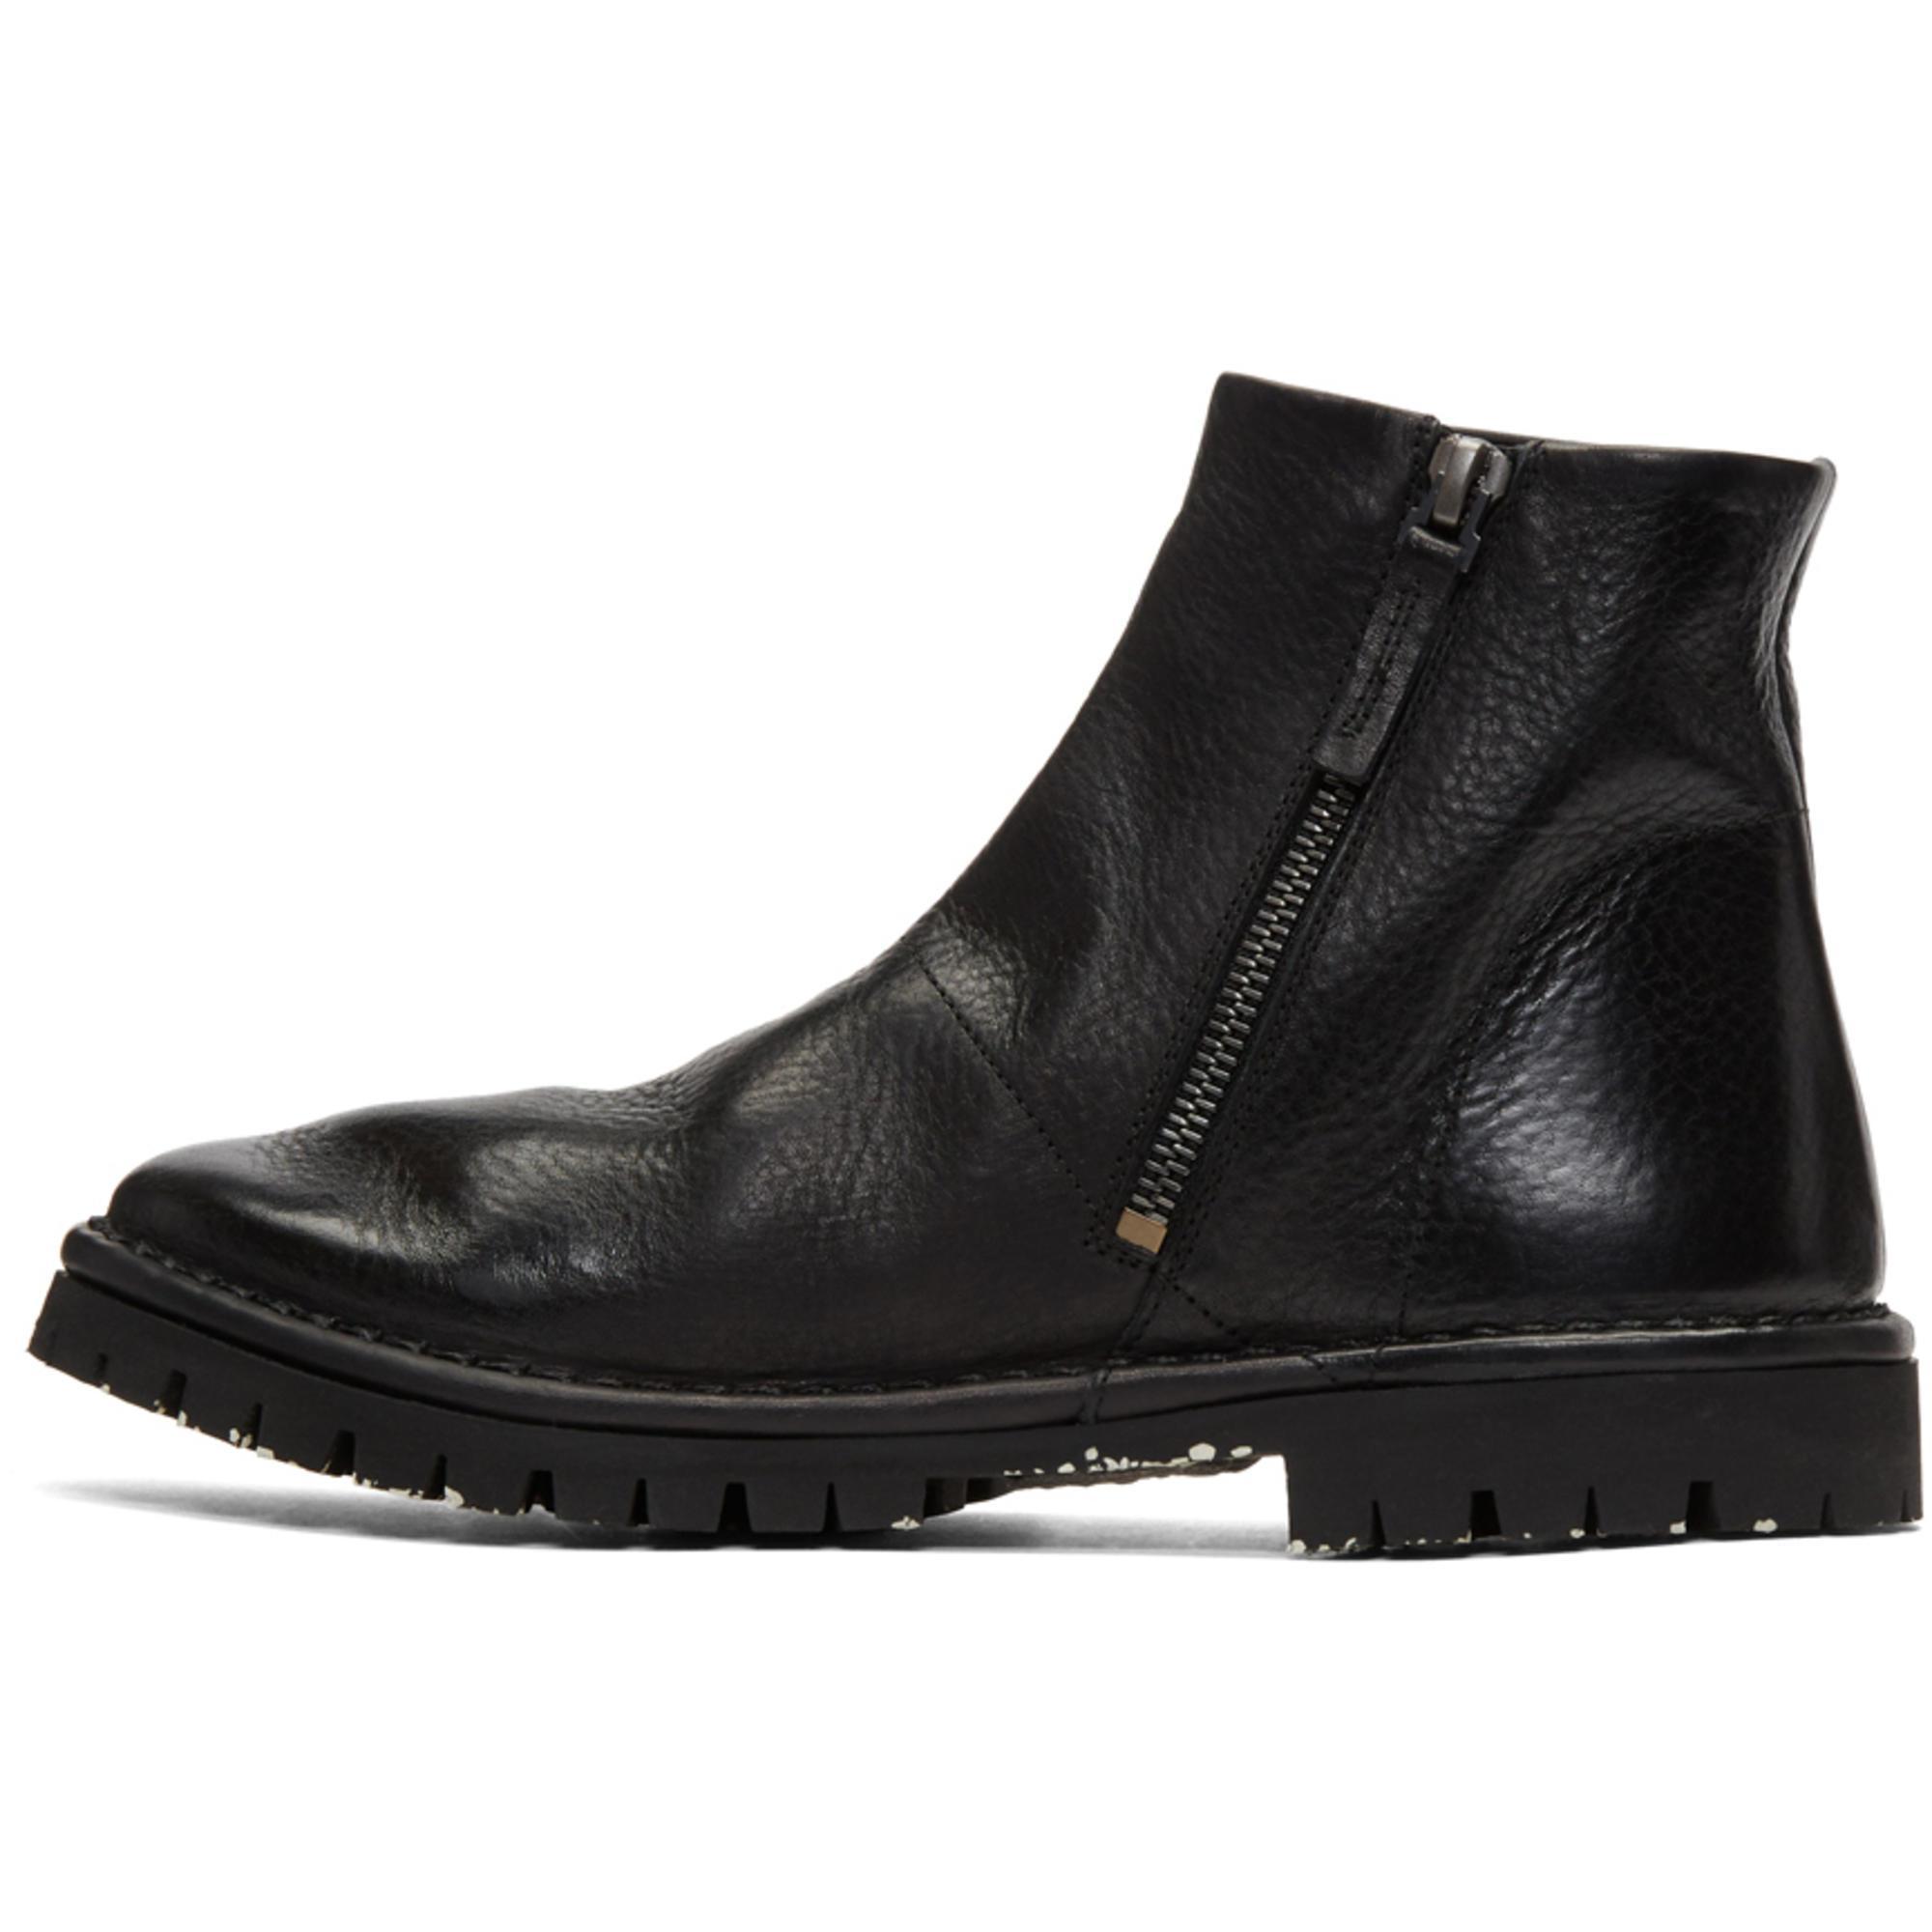 MARSèLL Black Santacco Boots Sites À Bas Prix LCjLE